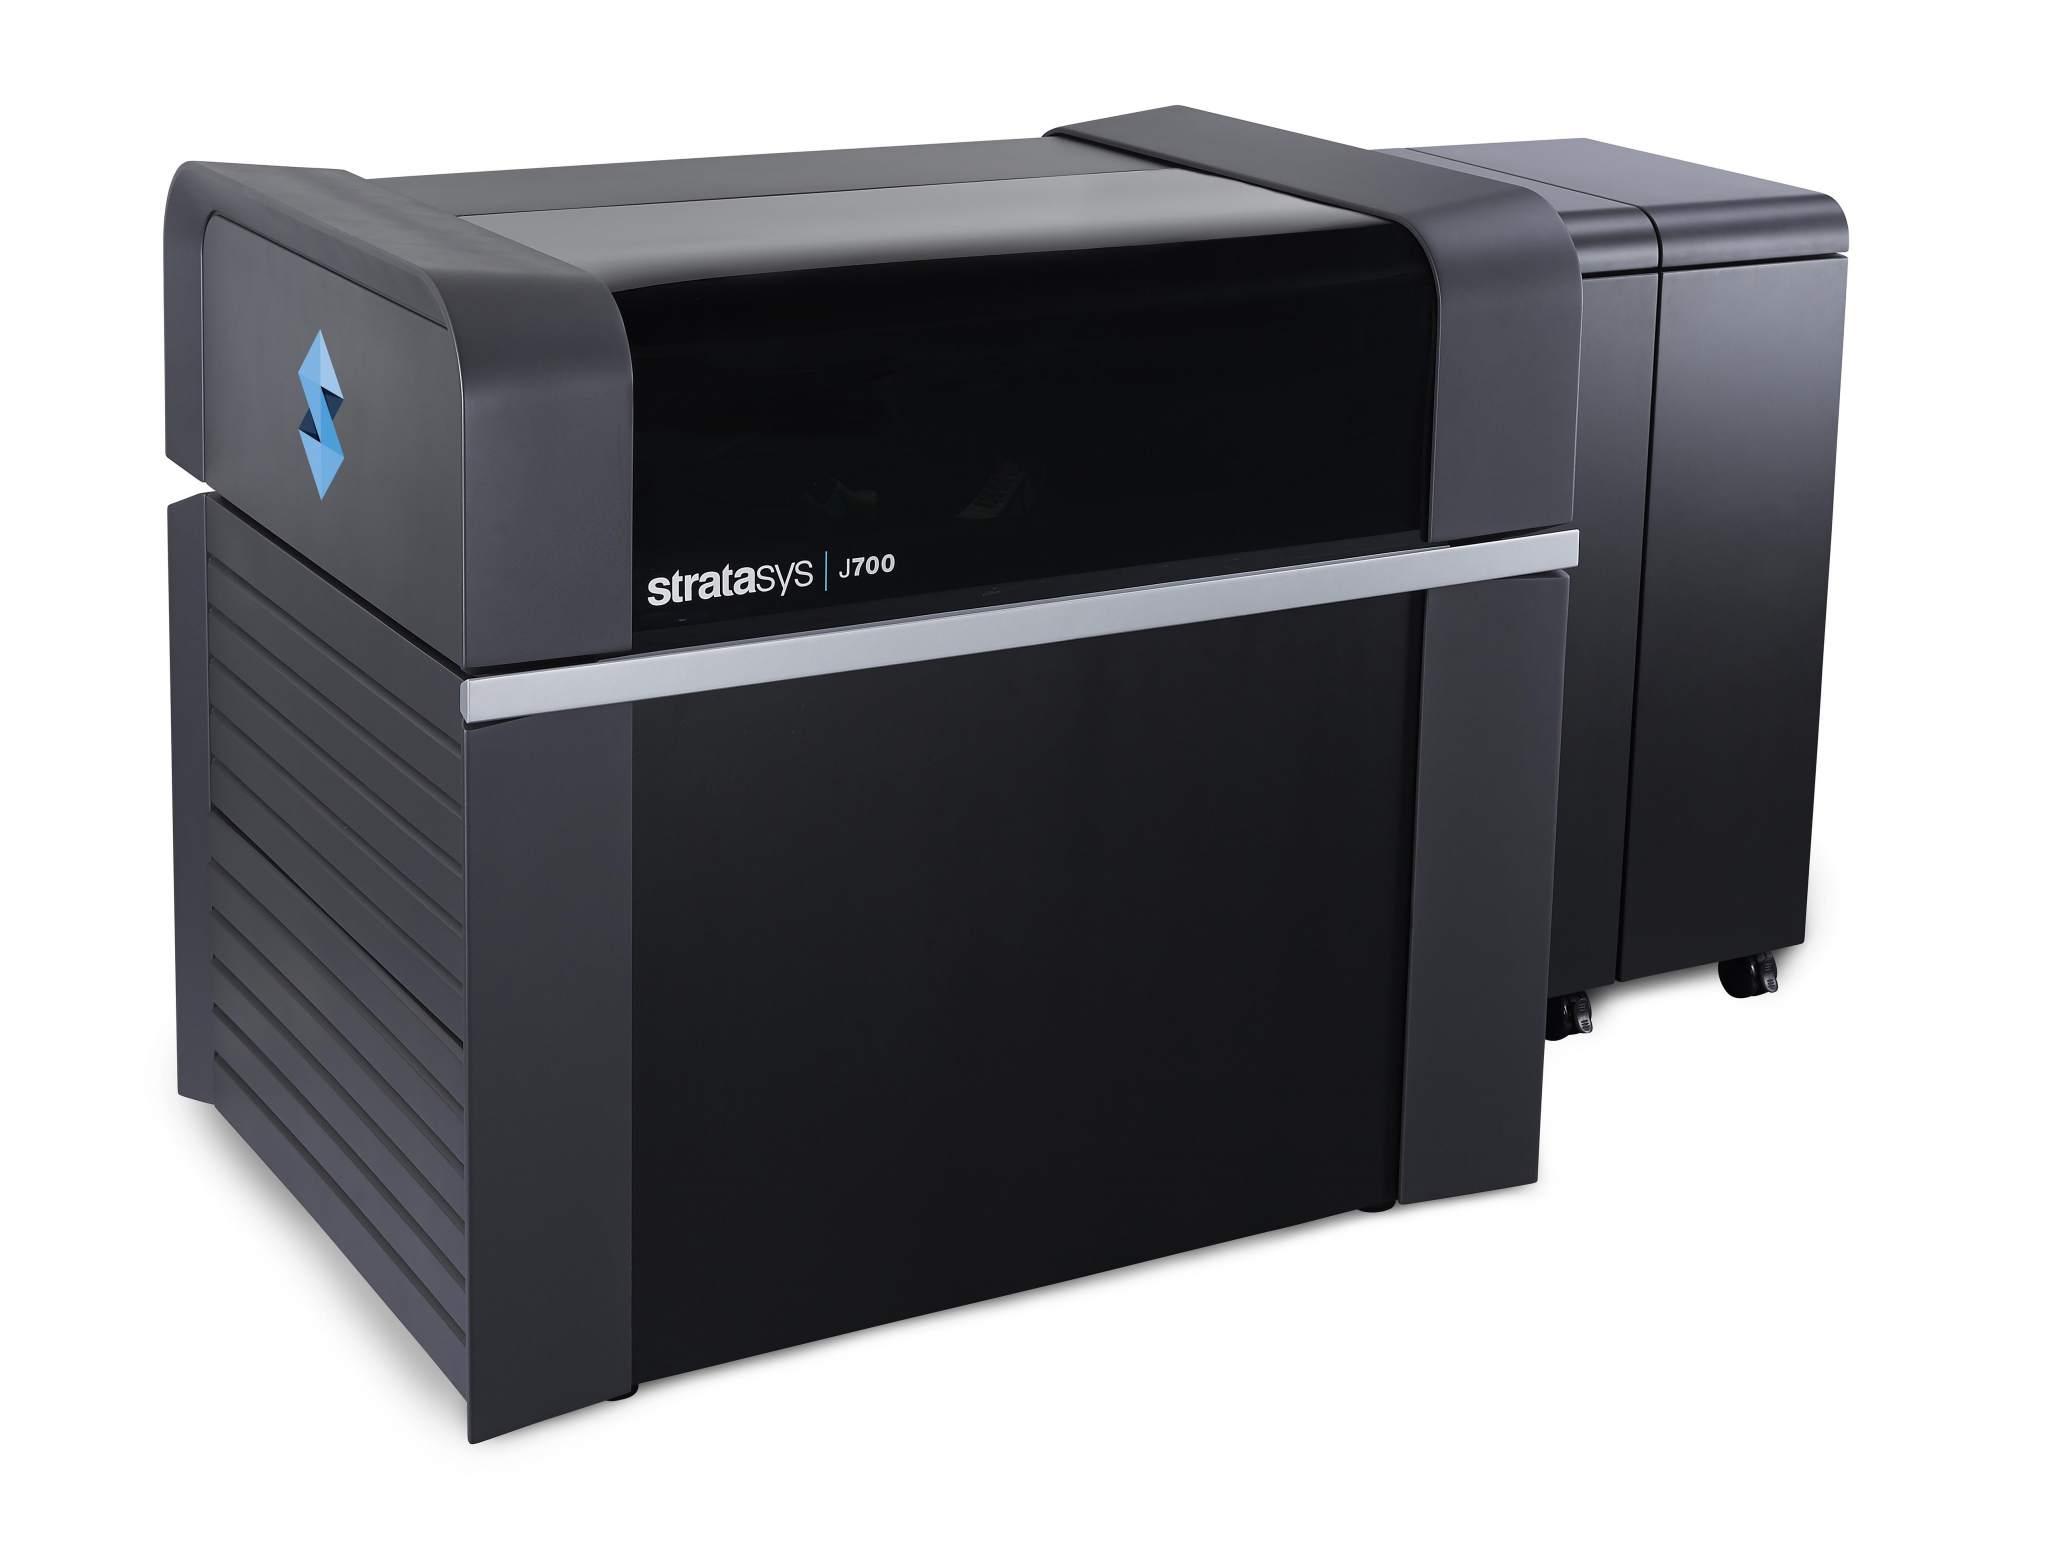 The Stratasys J700 3D printe. Image via Stratasys.